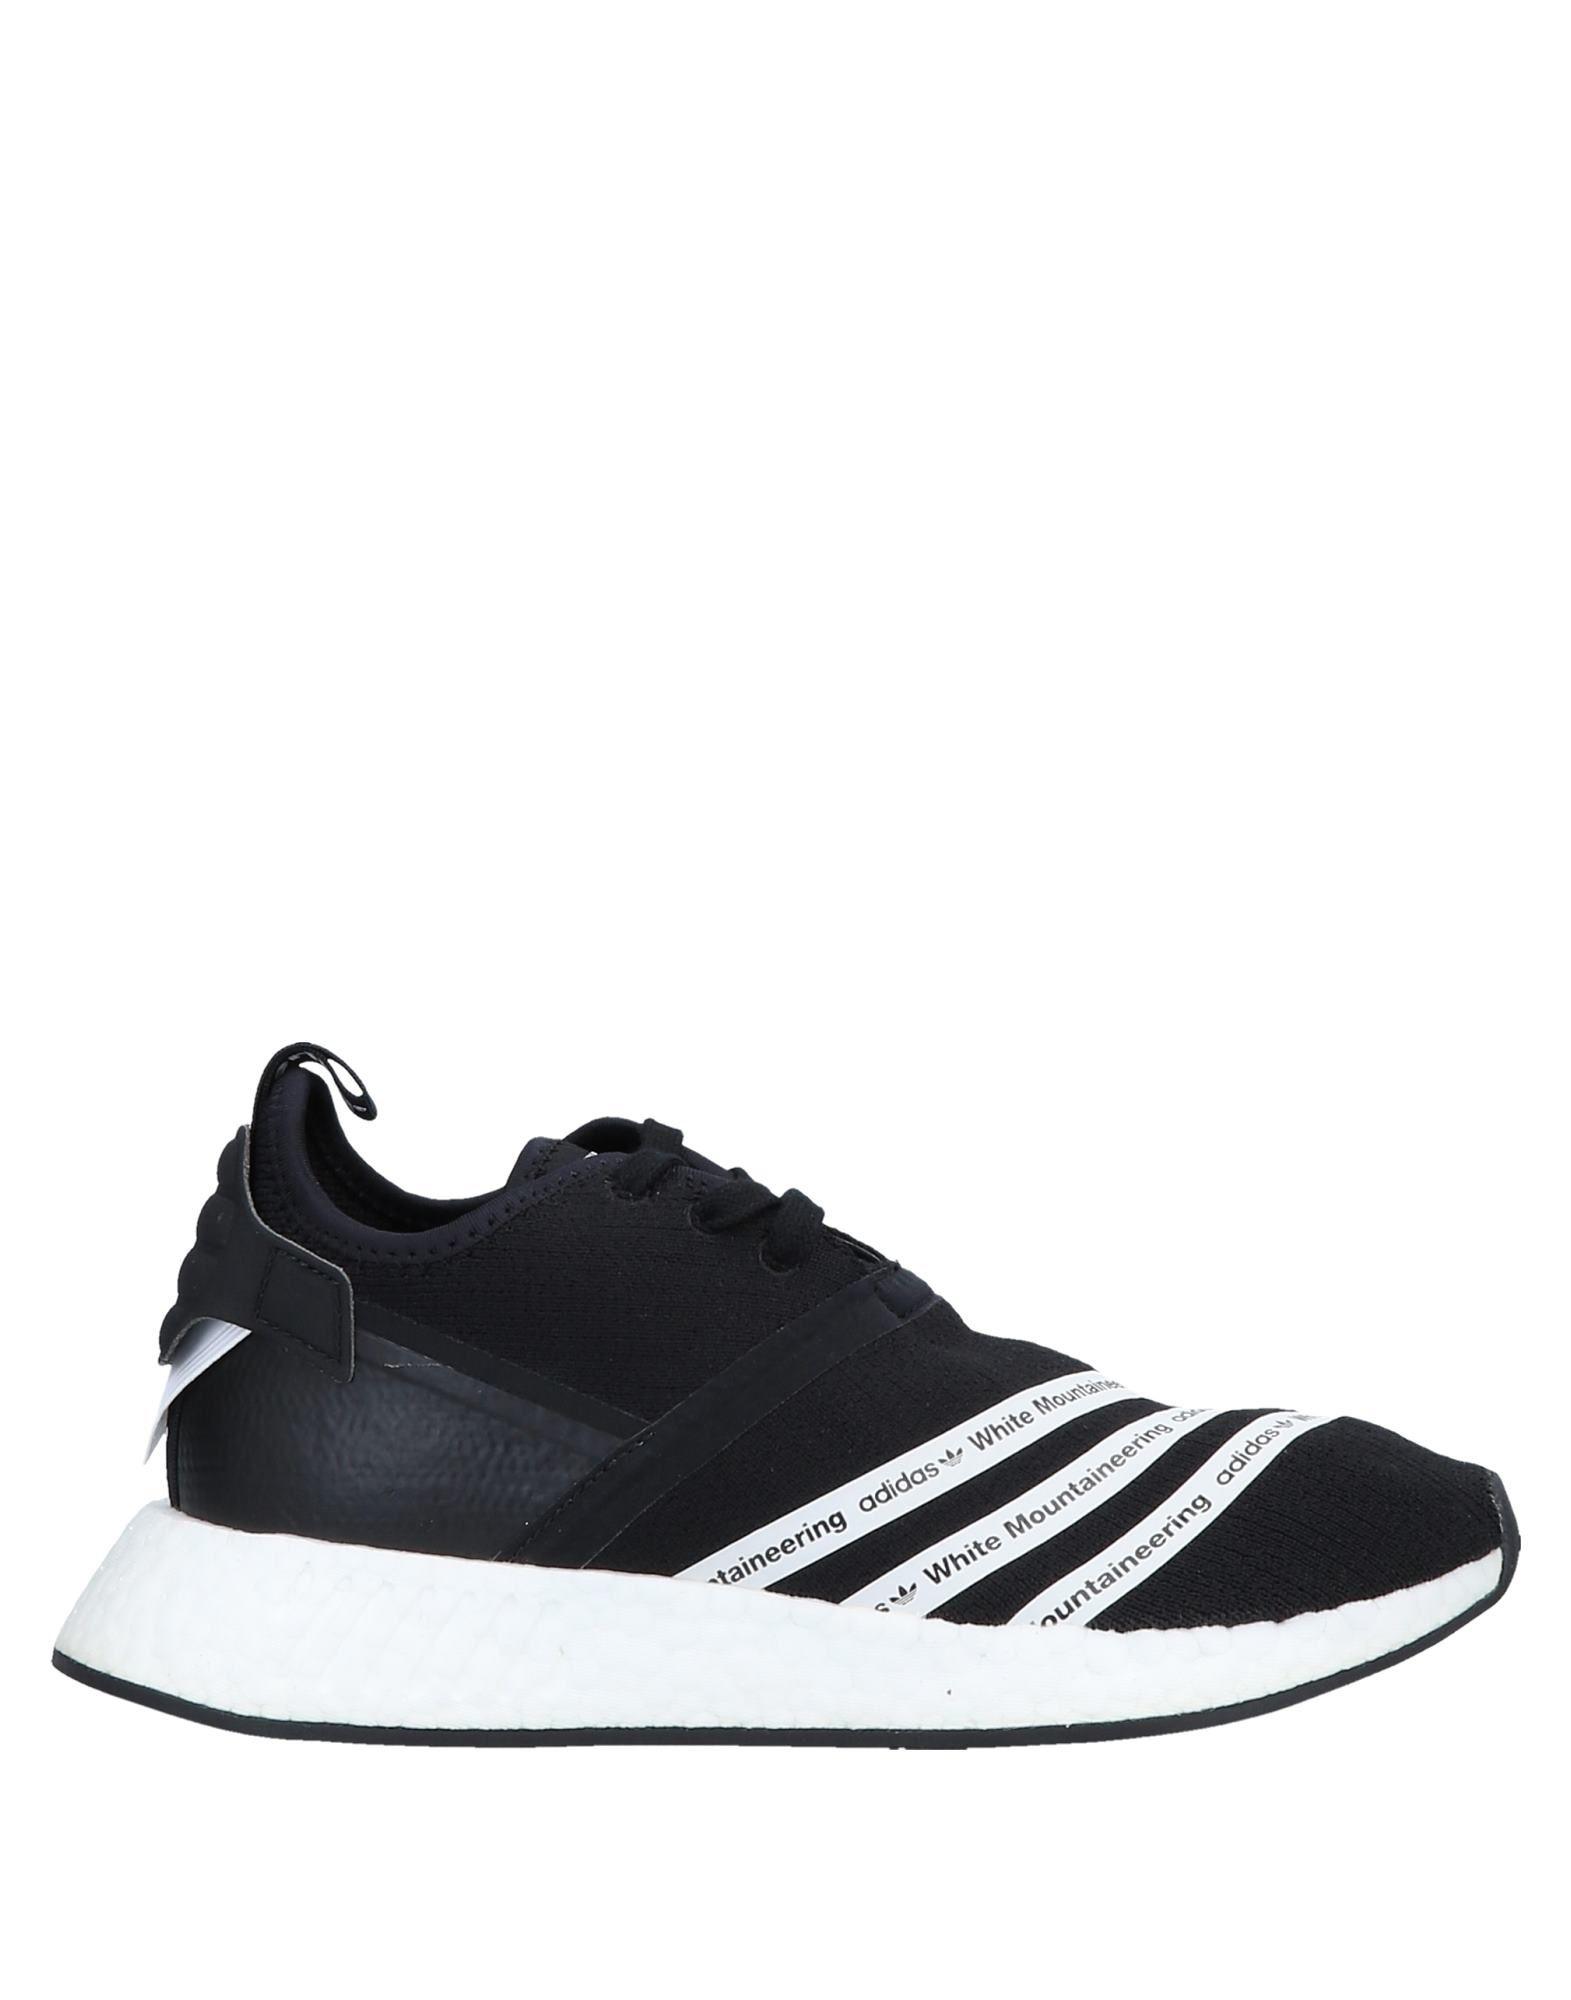 Adidas Originals Sneakers Sneakers - Men Adidas Originals Sneakers Sneakers online on  Australia - 11570841HB 3856fe